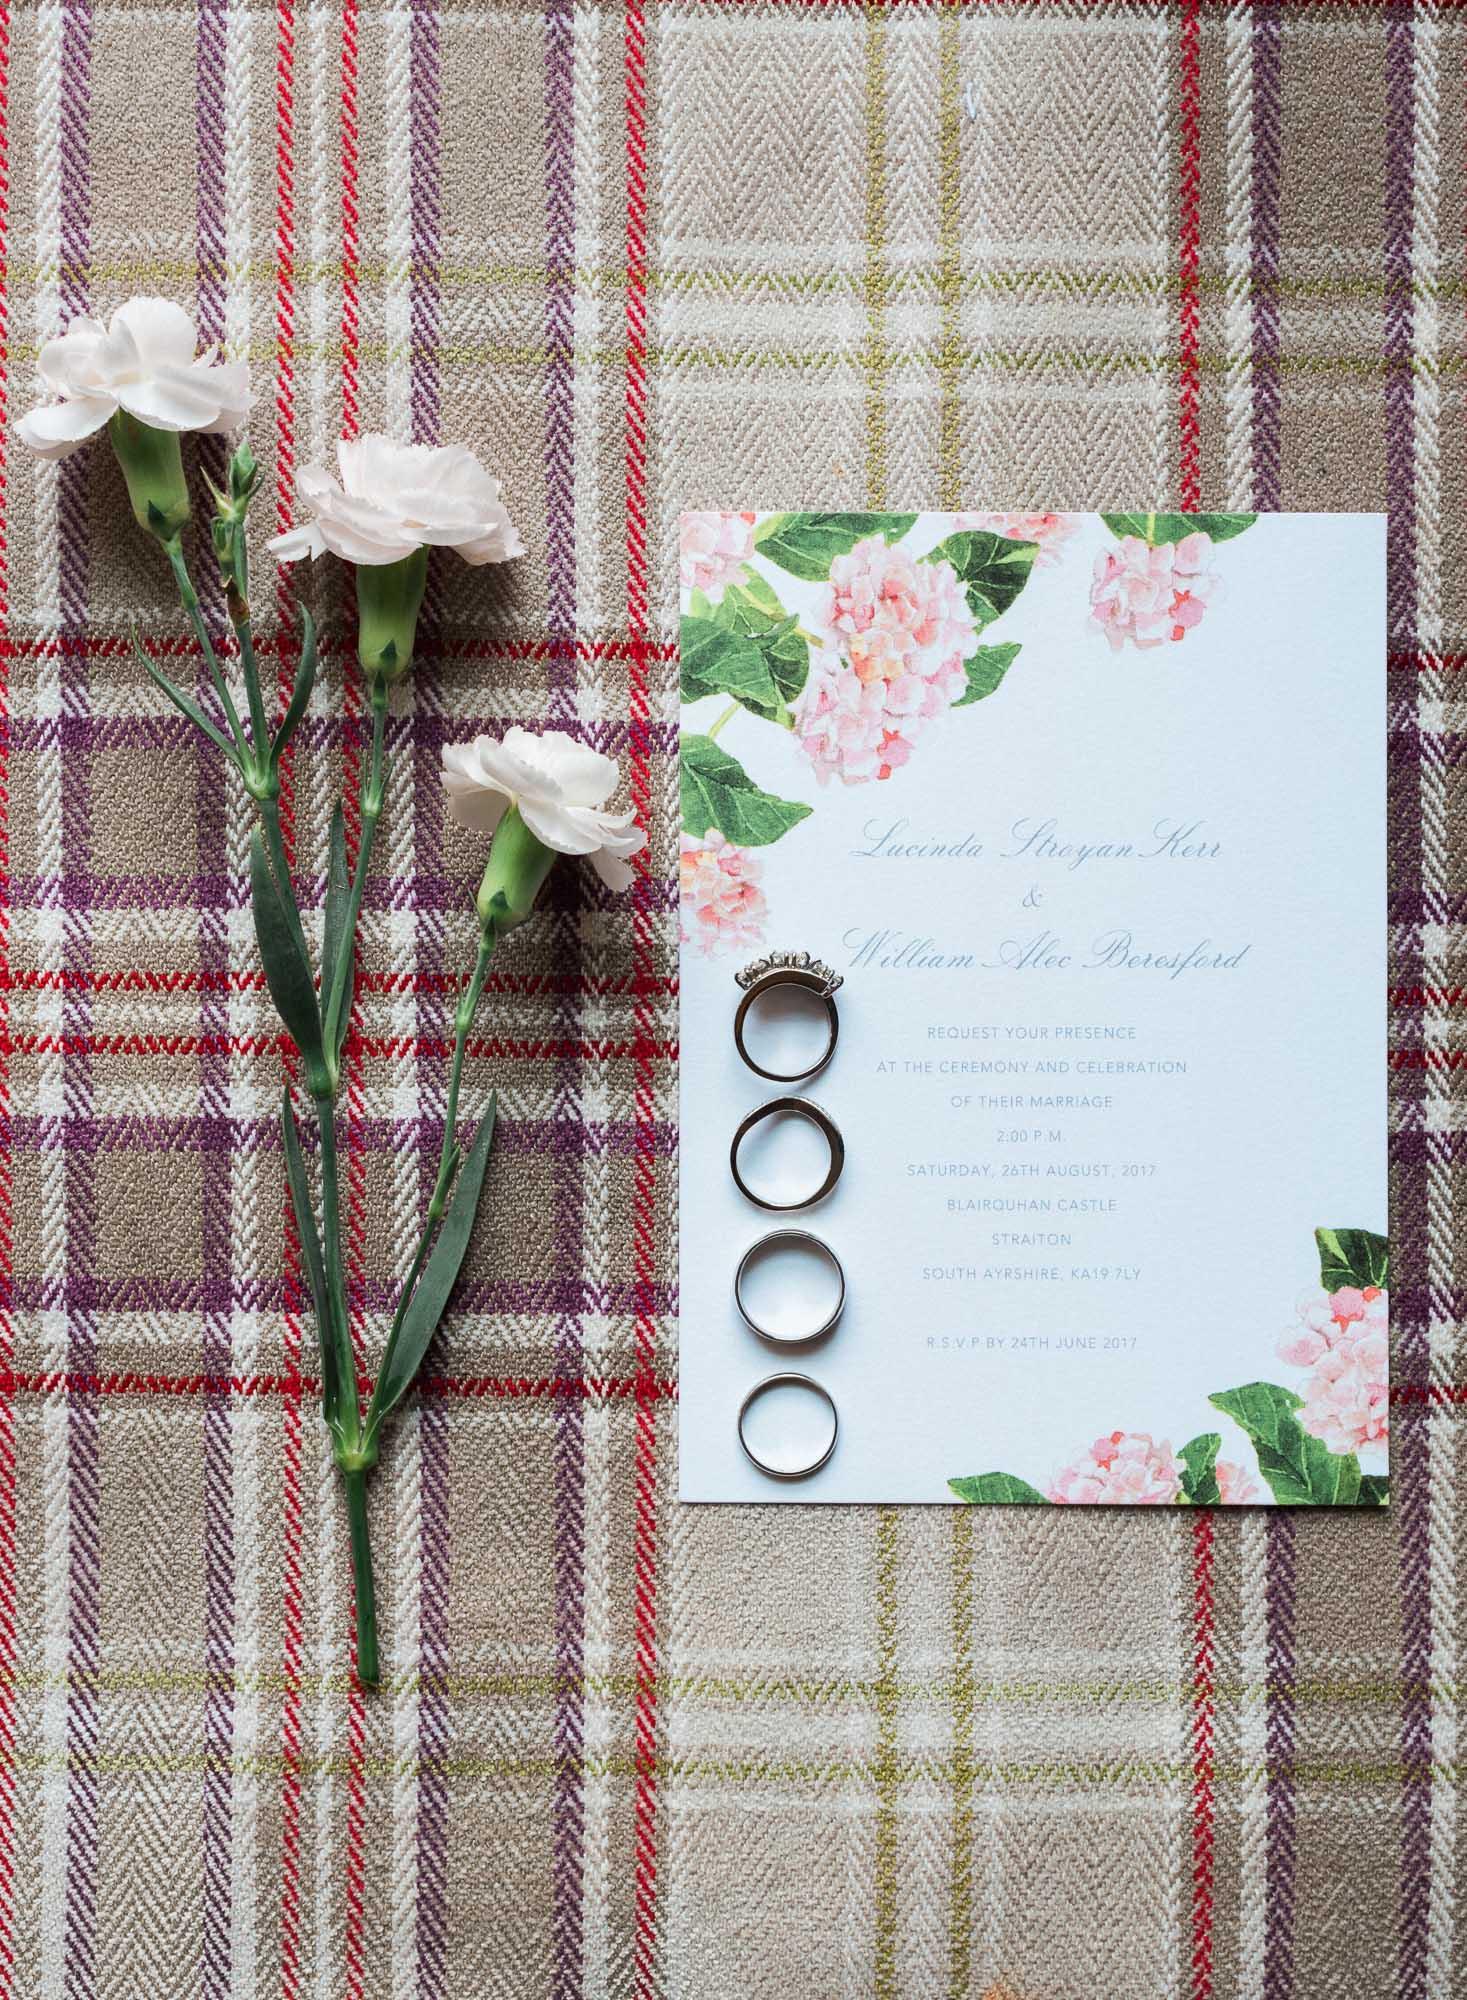 scottish_wedding_blairquhan_castle-4.jpg